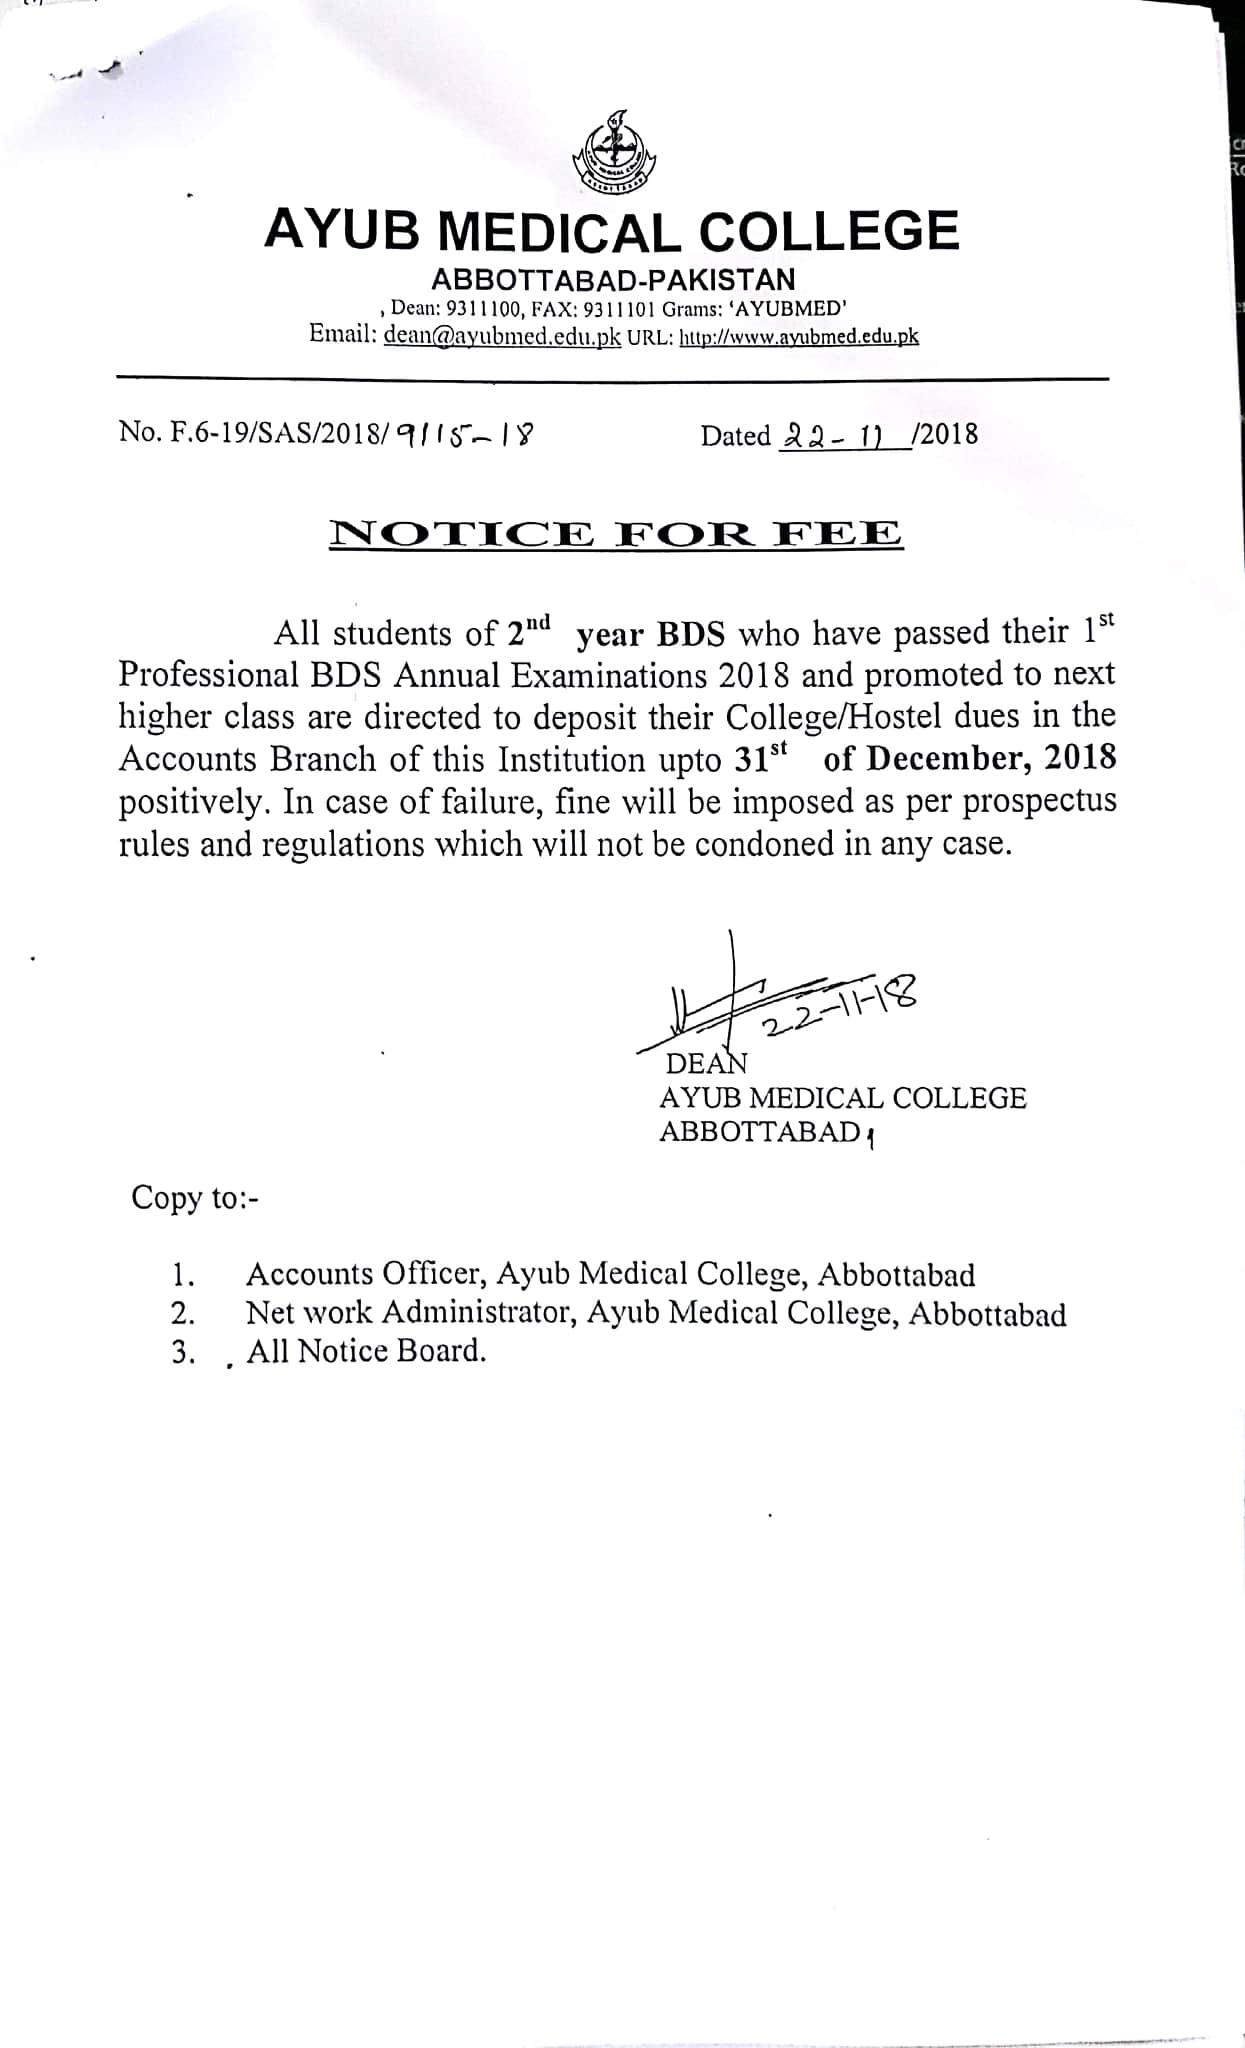 Notice Board - Ayub Medical College, Abbottabad